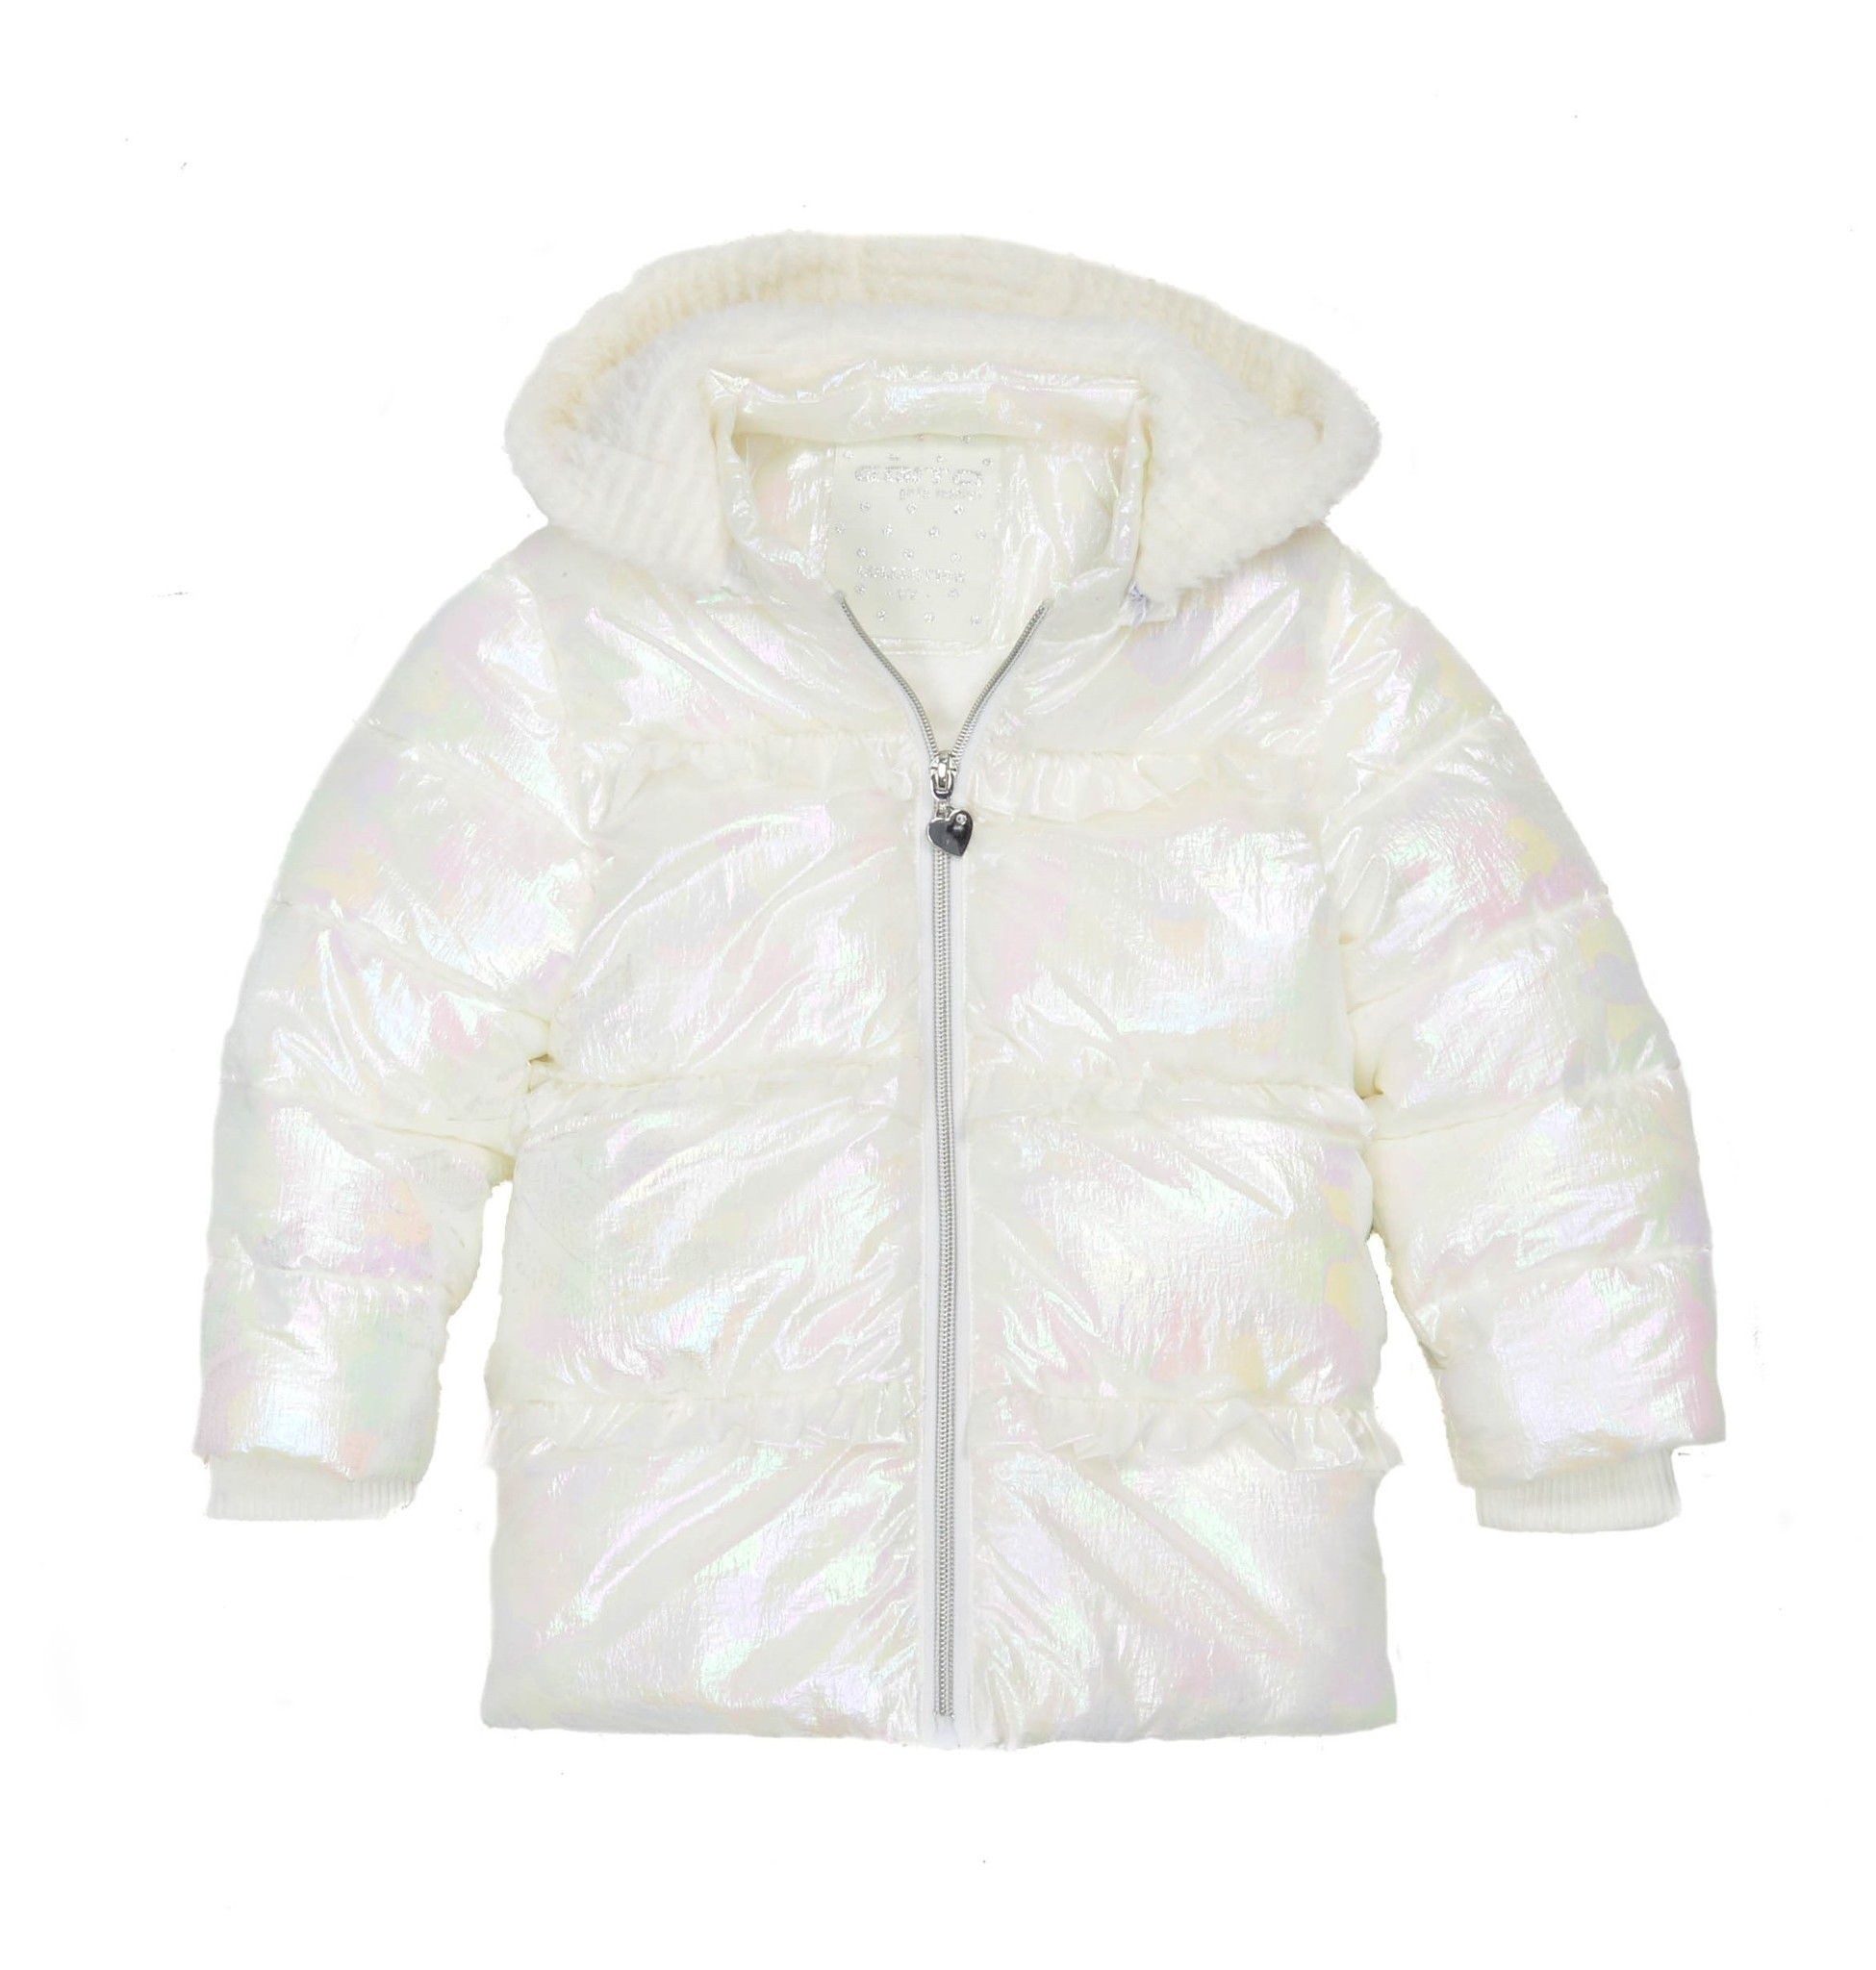 Ebita Ebita Girls Coat - 5247